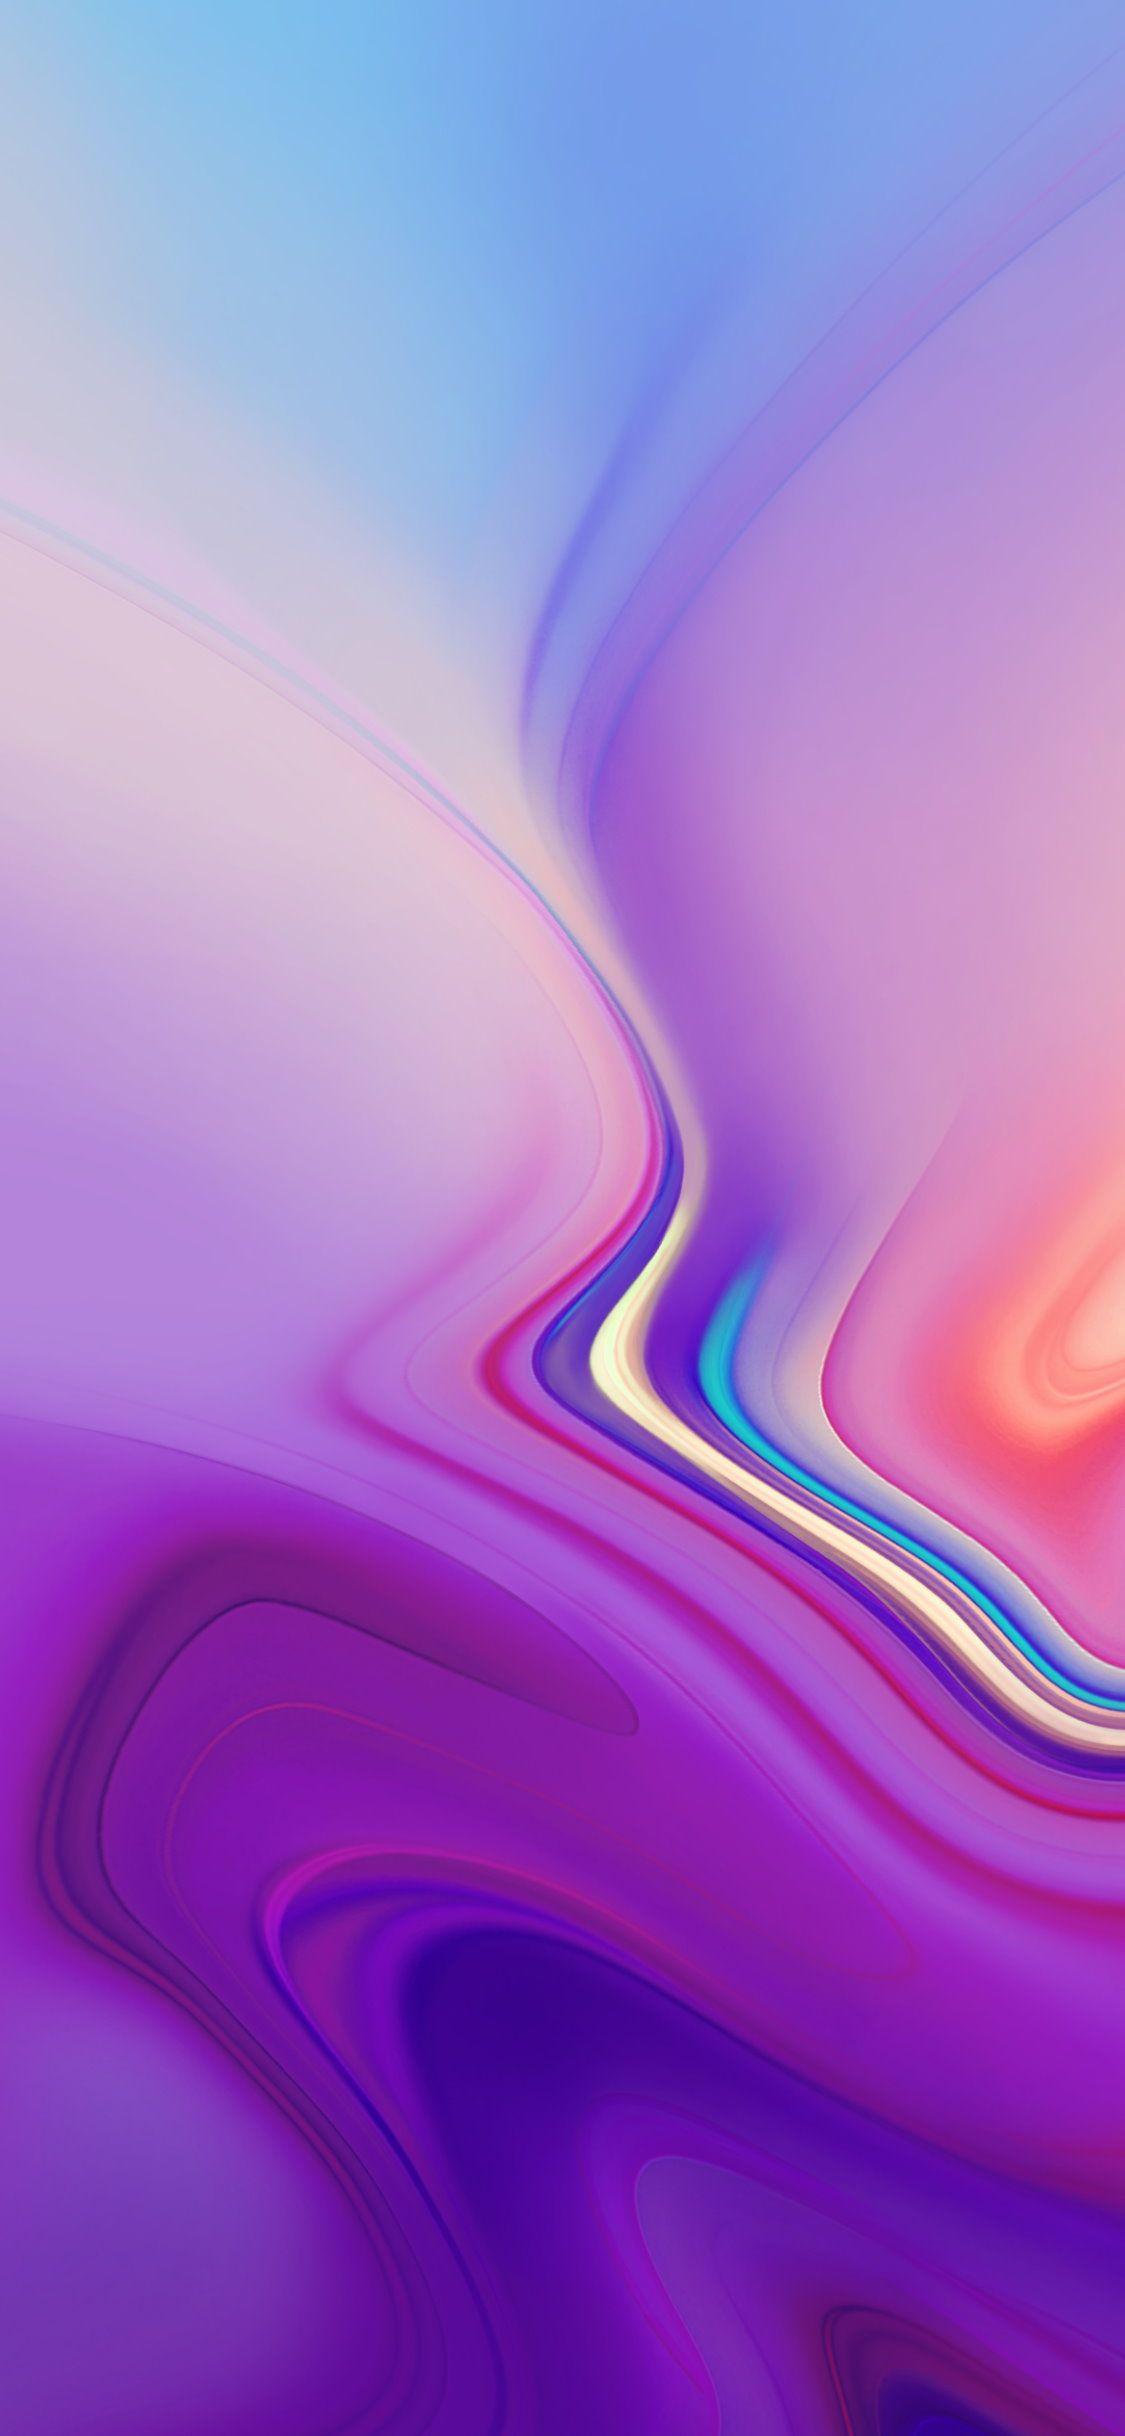 Wallpapers Iphone X Fond D Ecran Iphone Pastel Fond D Ecran Android Fond D Ecran Iphone Disney